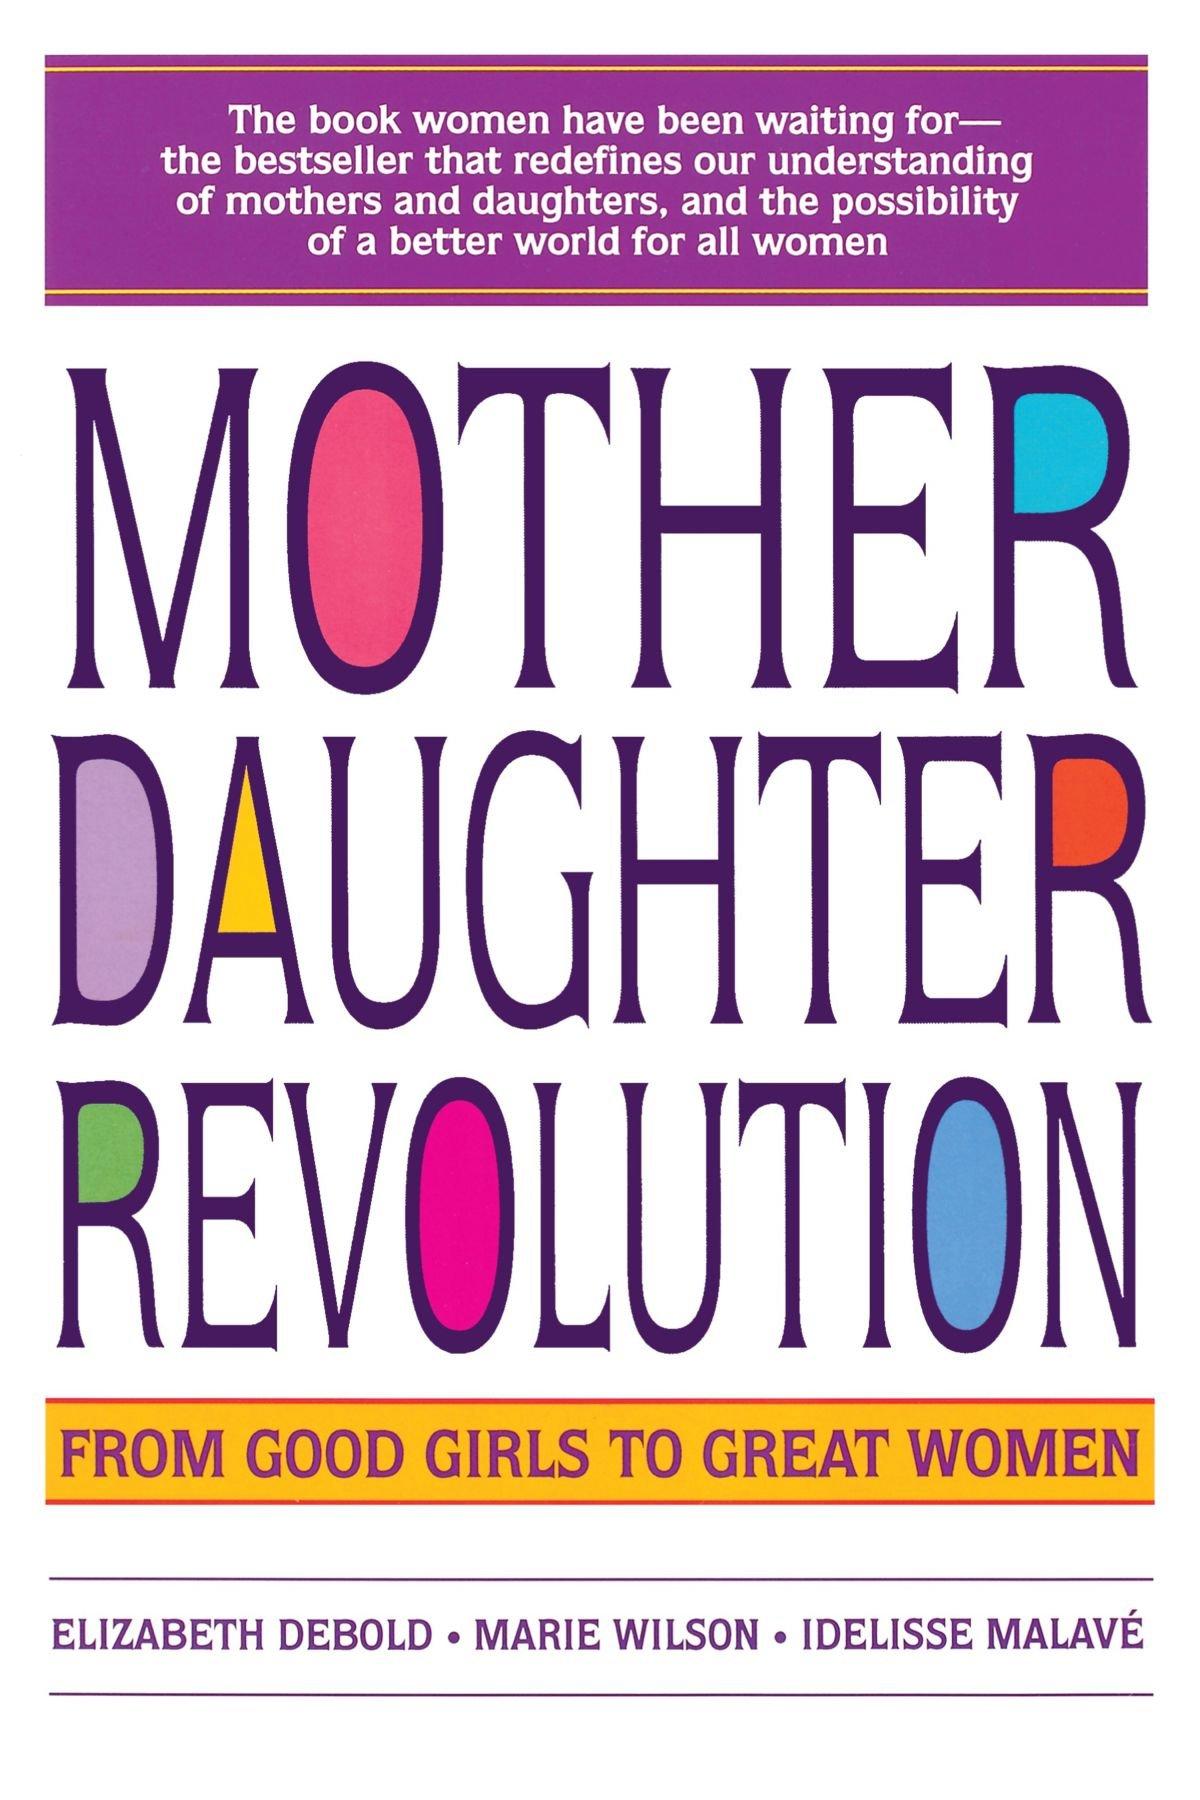 Amazon.com: Mother Daughter Revolution: From Good Girls to Great Women  (9780553374186): Elizabeth Debold, Marie C. Wilson, Idelisse Malave: Books